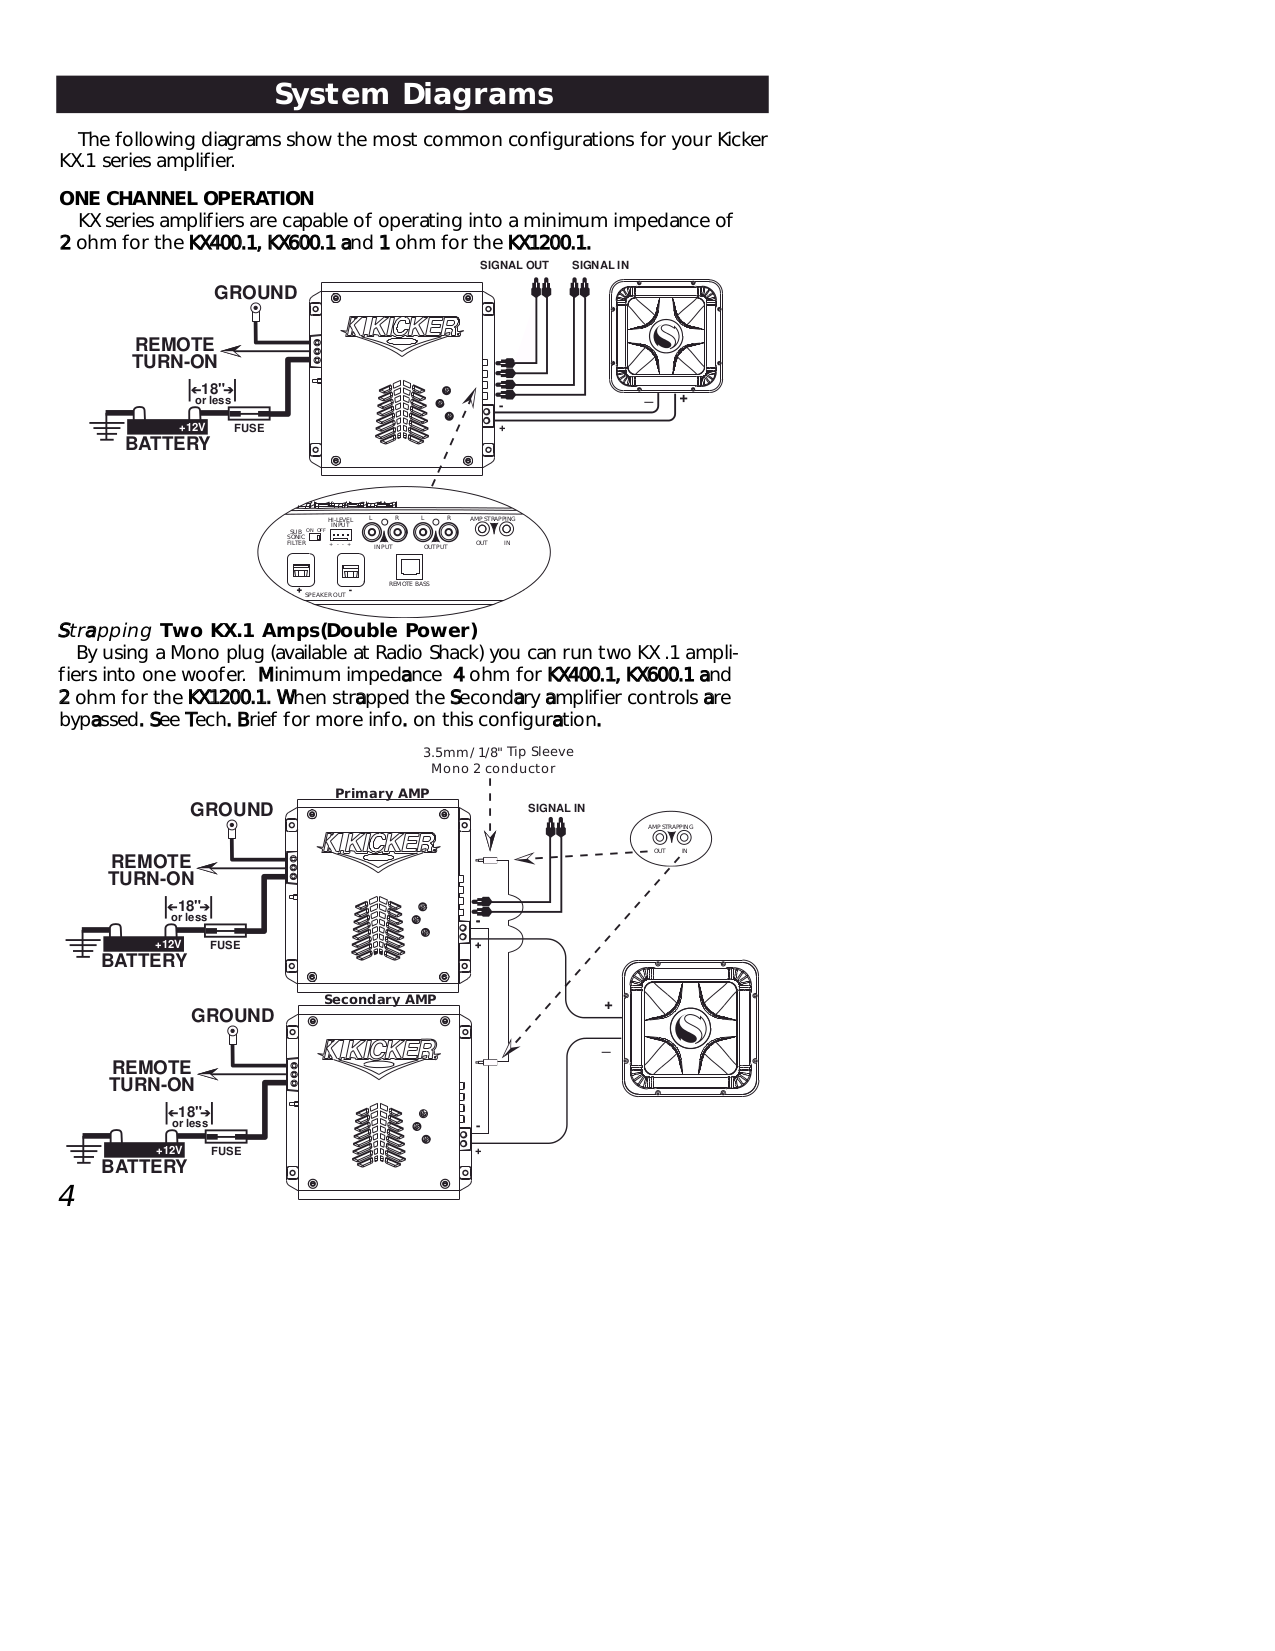 Pdf Manual For Kicker Car Amplifier Kx4002 Wiring Diagram Amp Page Preview